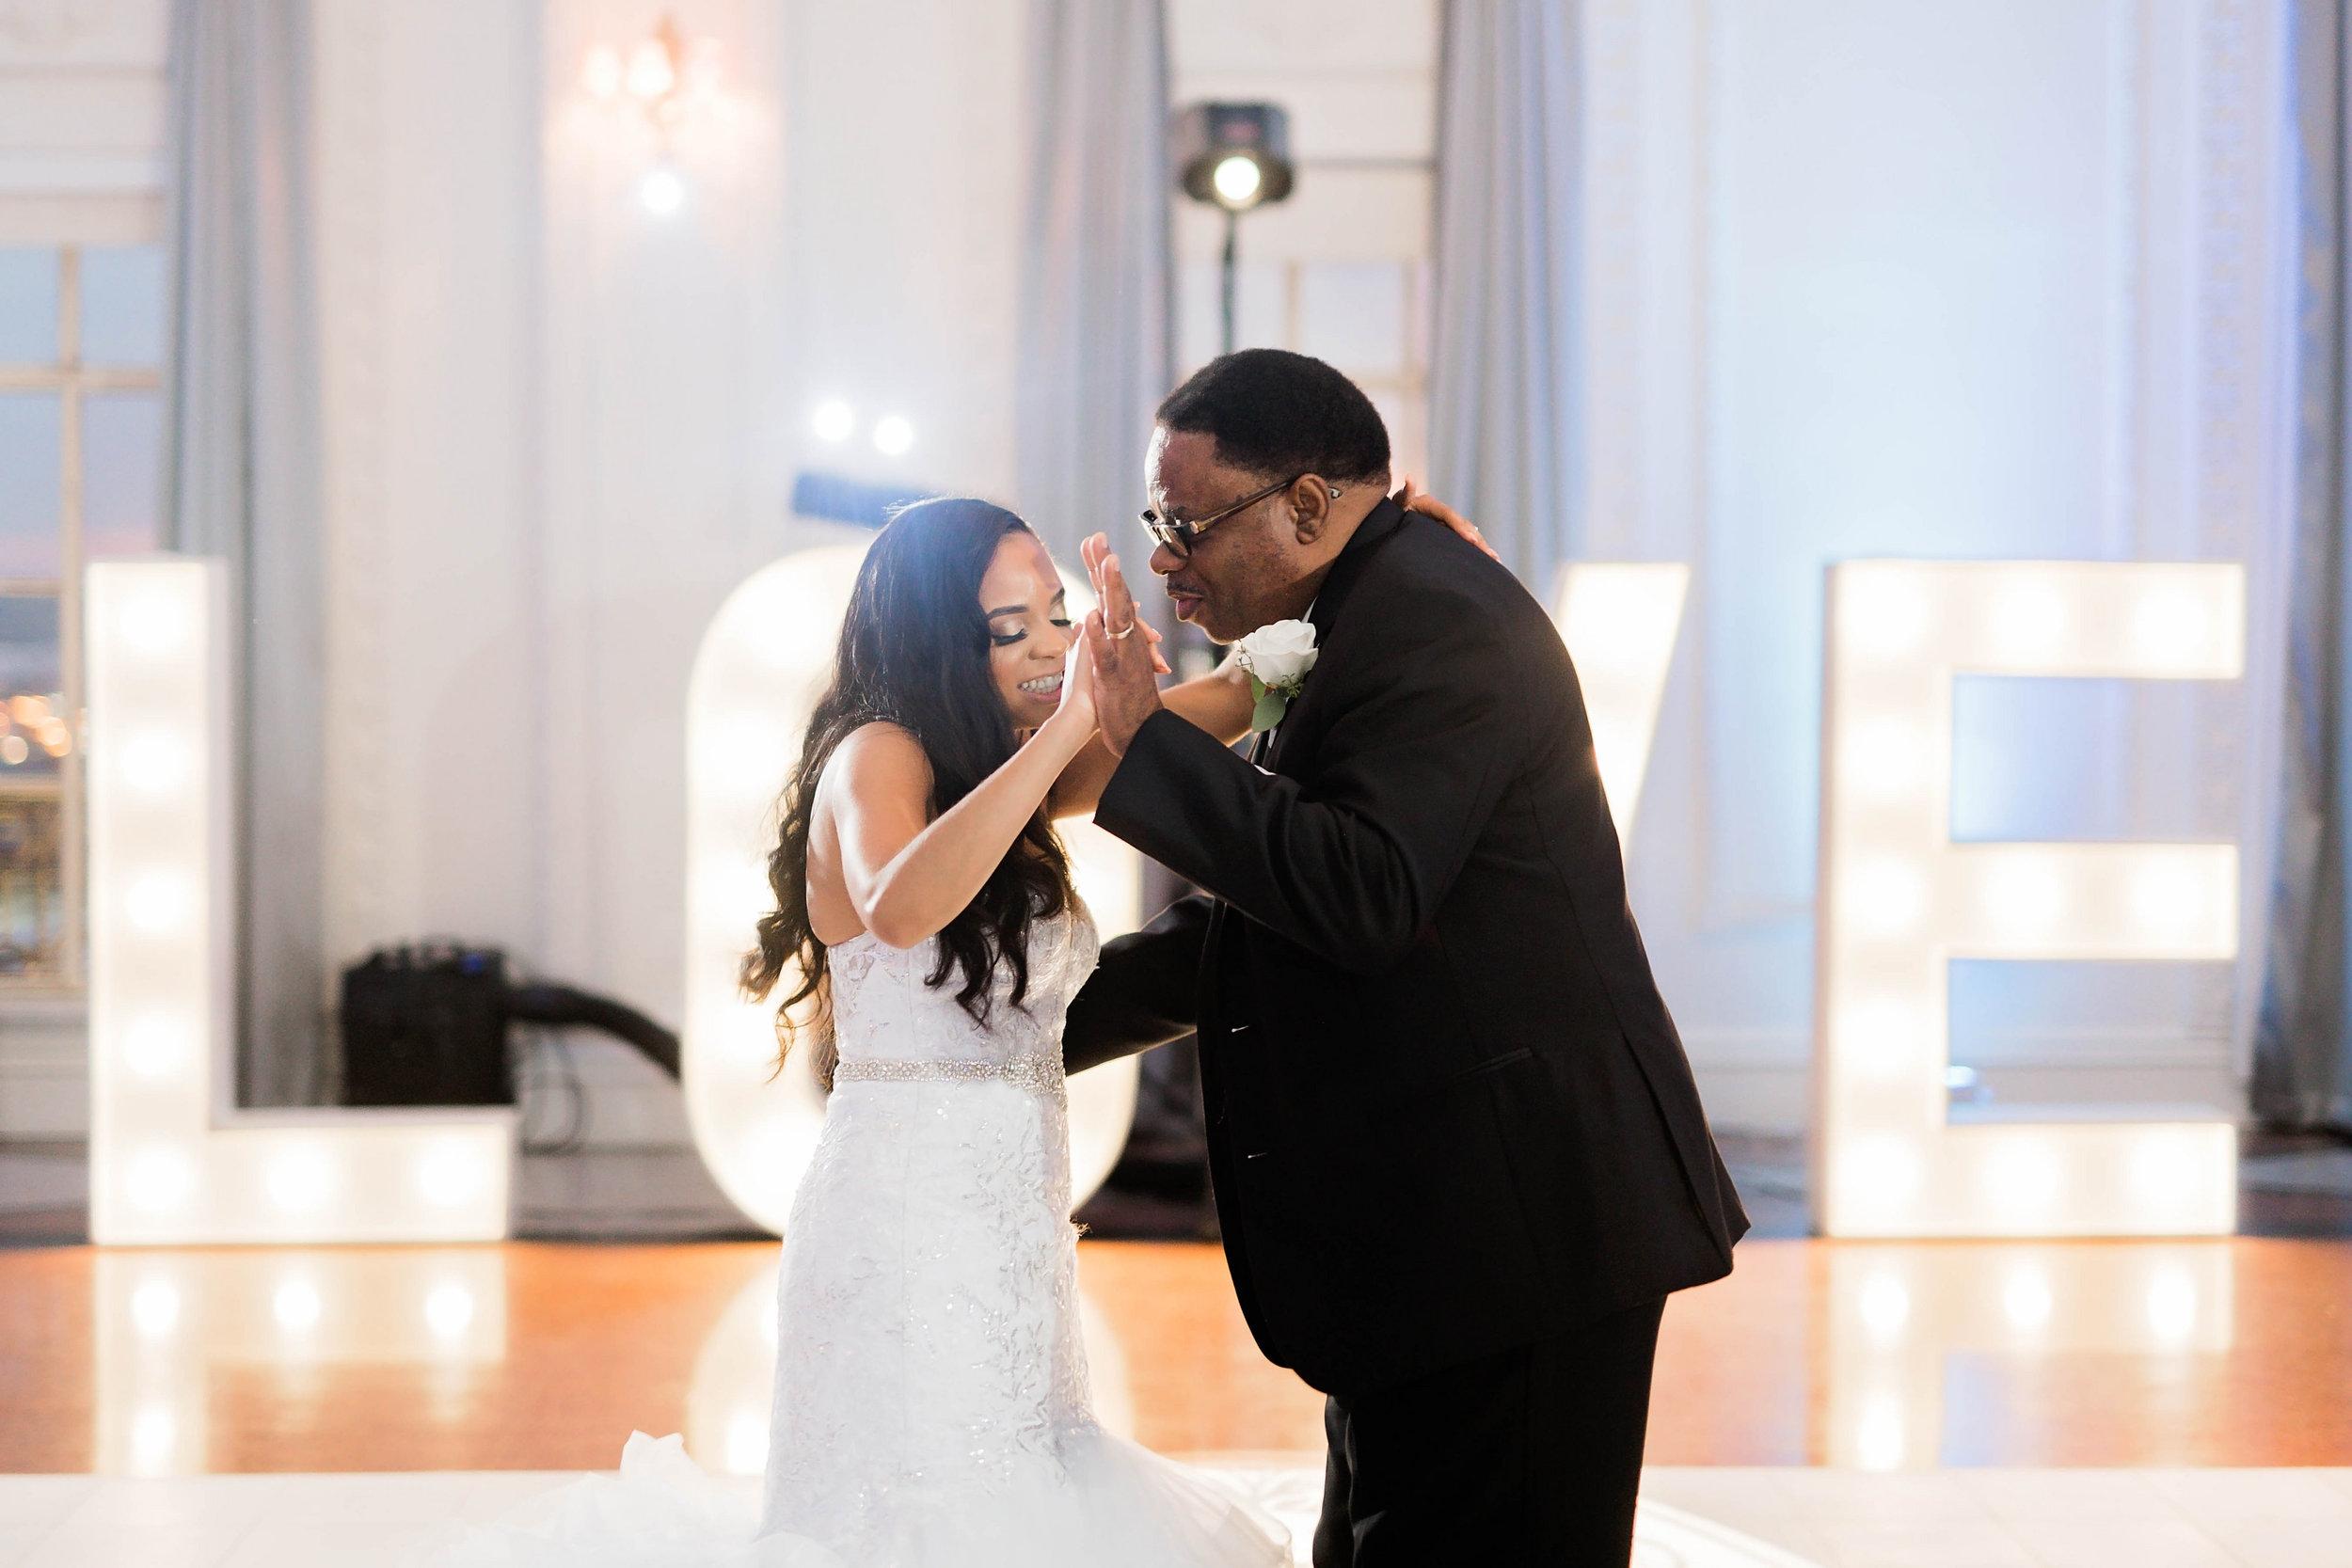 Tulsa Wedding- Pharris Photography- Reception- Darla + Quinton- Daddy Daughter Dance